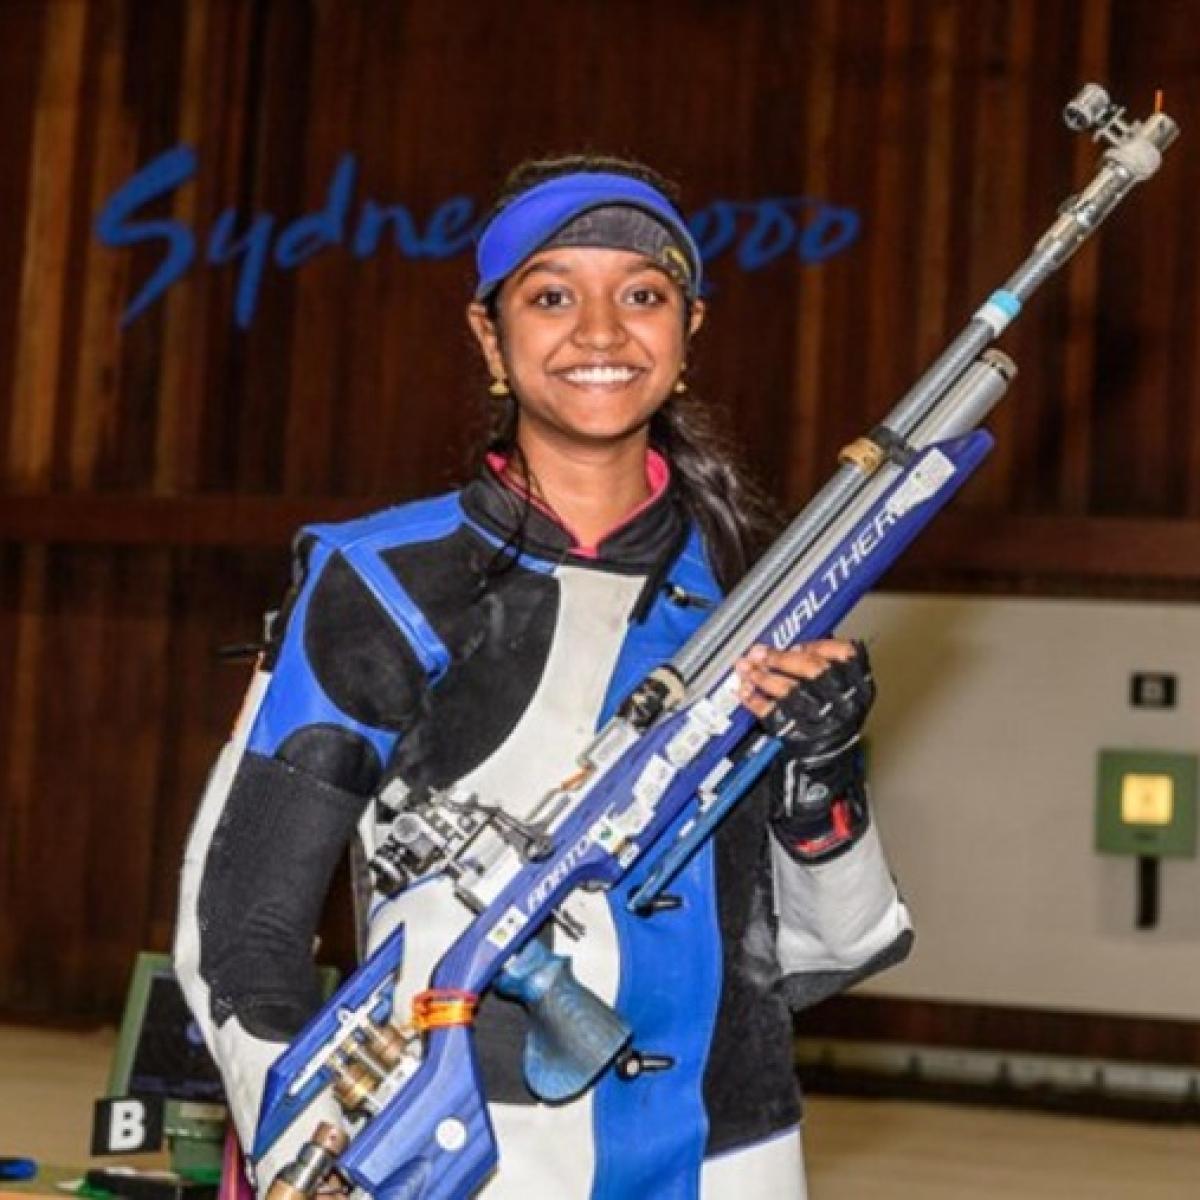 India's Elavenil Valarivan wins gold in 10m Air Rifle event at Shooting World Cup in Rio de Janiero